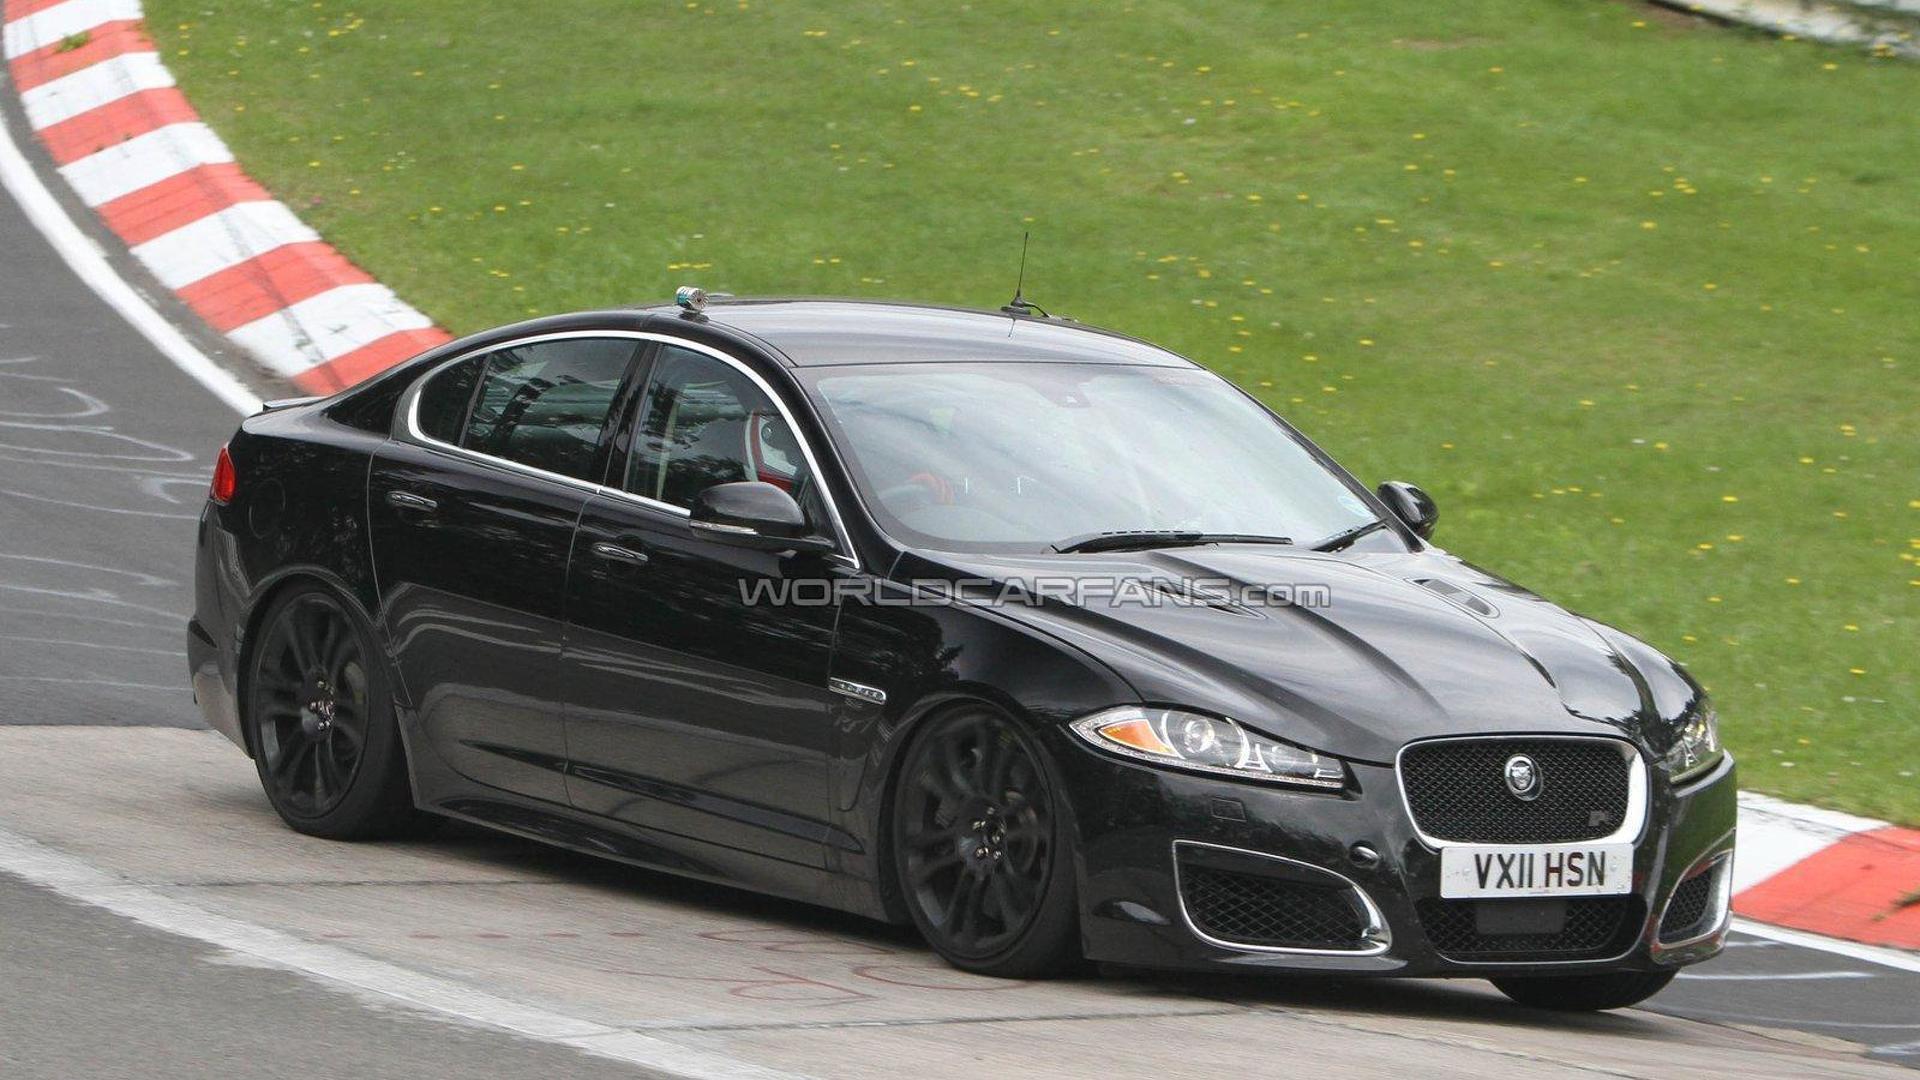 rac trim used jaguar xfr cars xf sale for